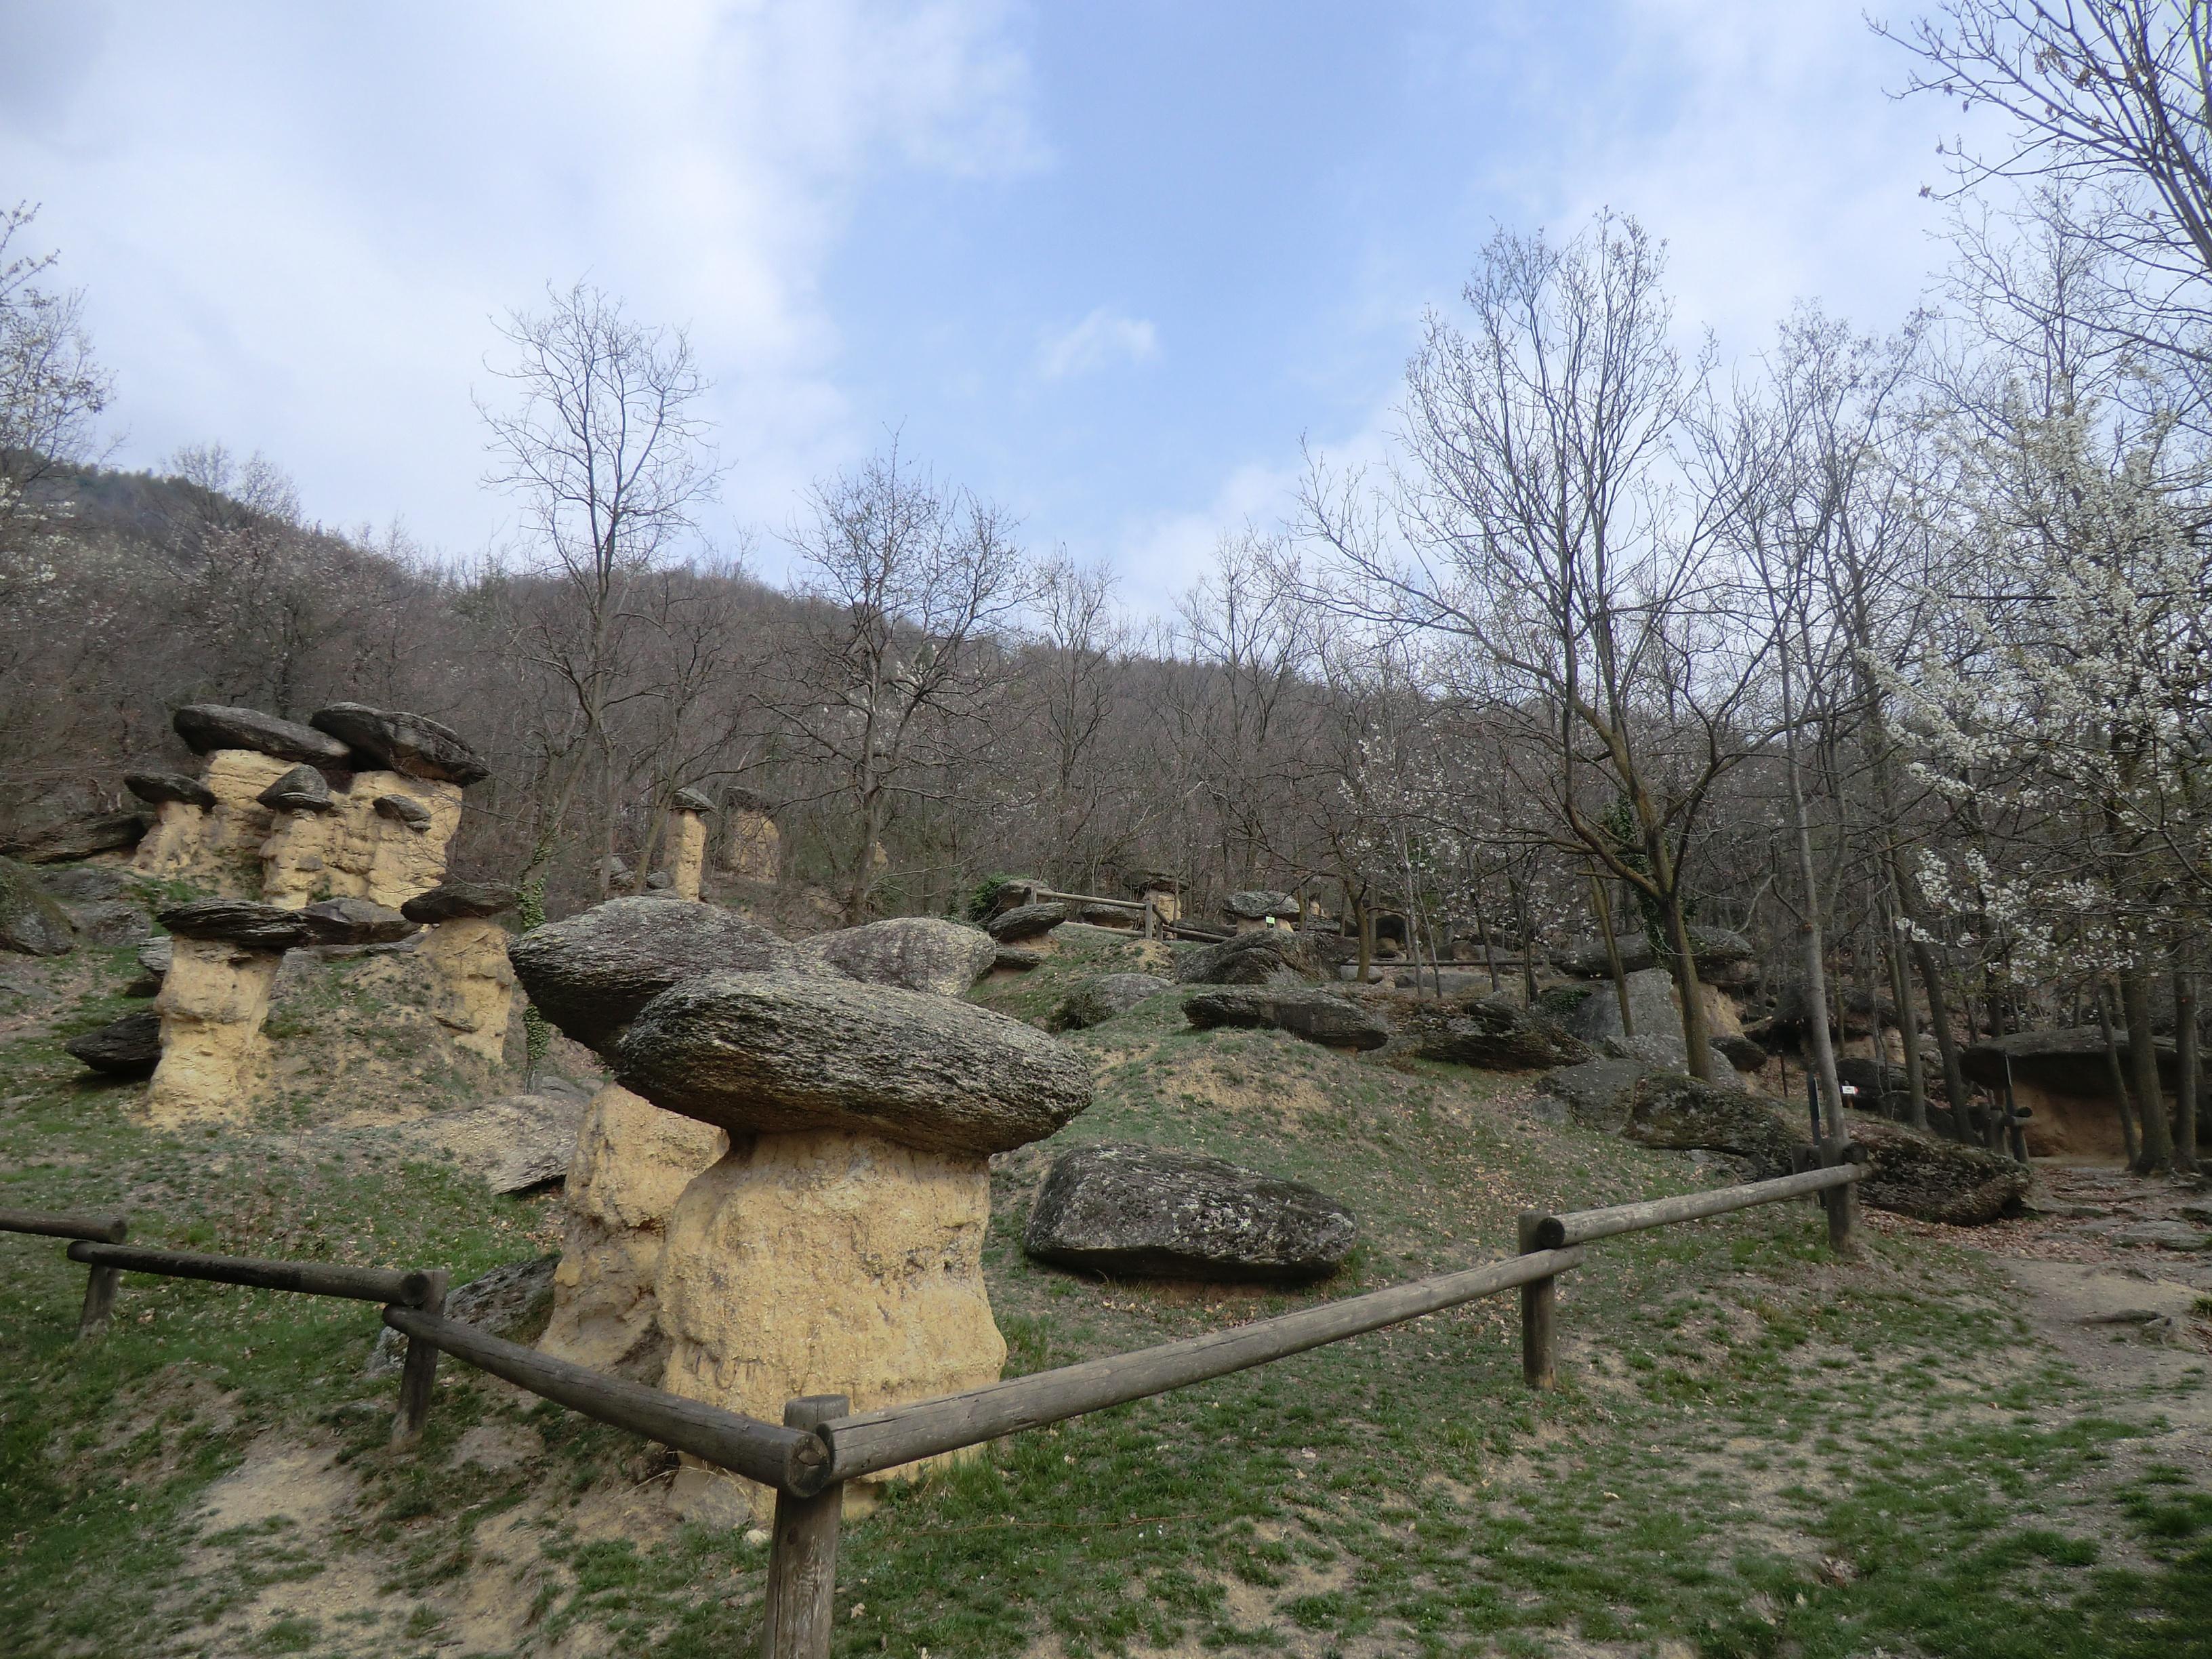 Villar San Costanzo Cap